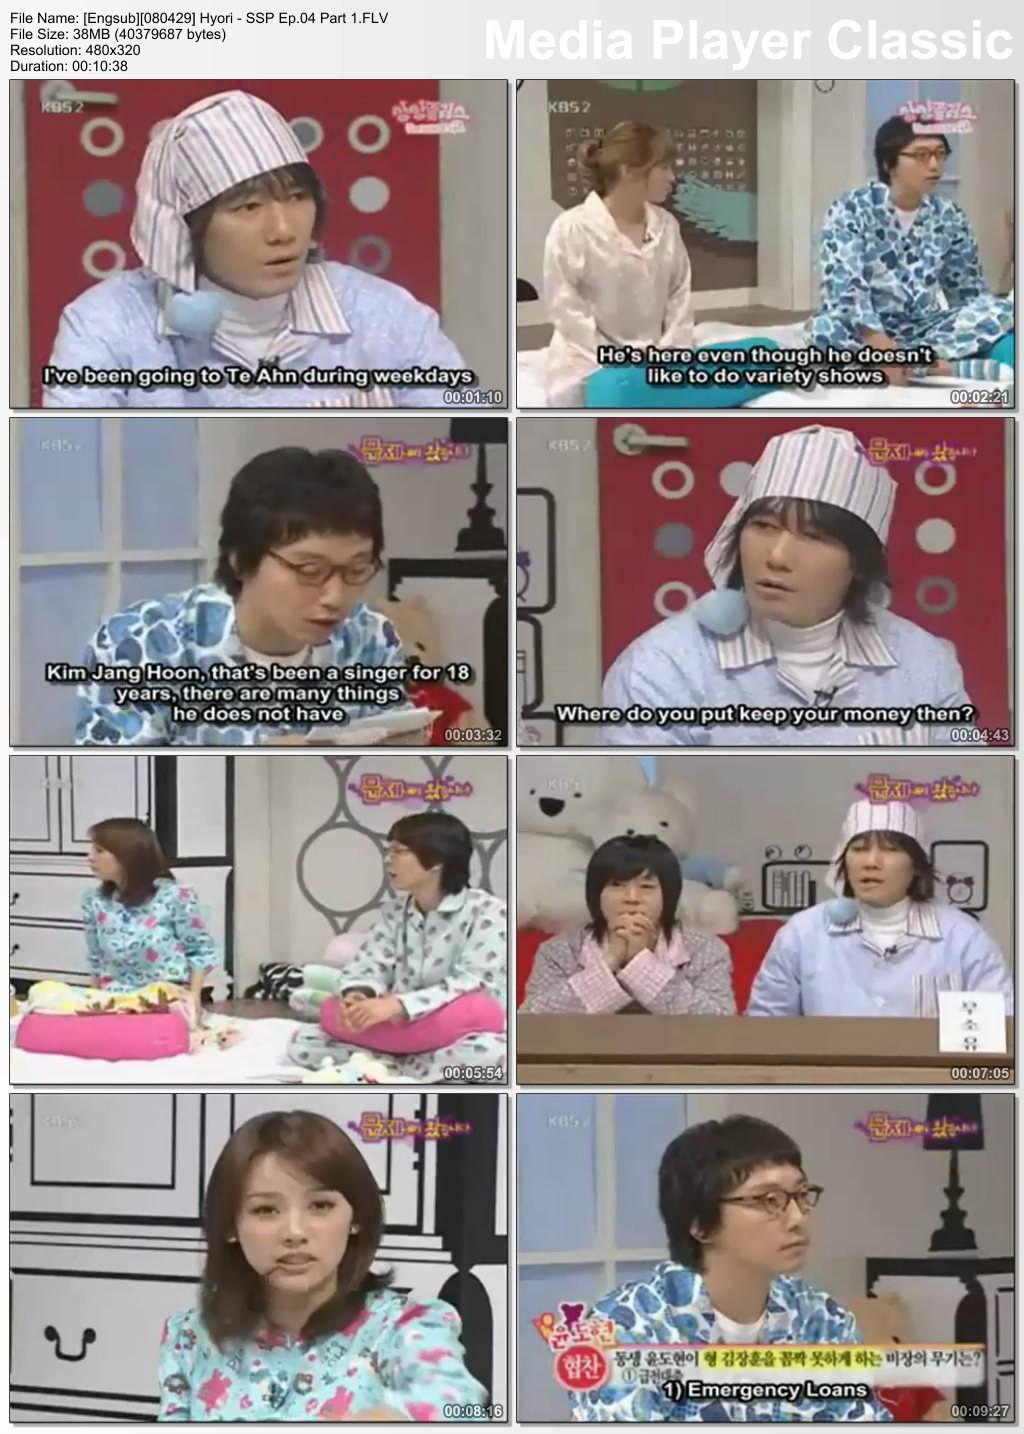 [Engsub][080429] Hyori - Sang Sang Plus Ep.04 Engsub29